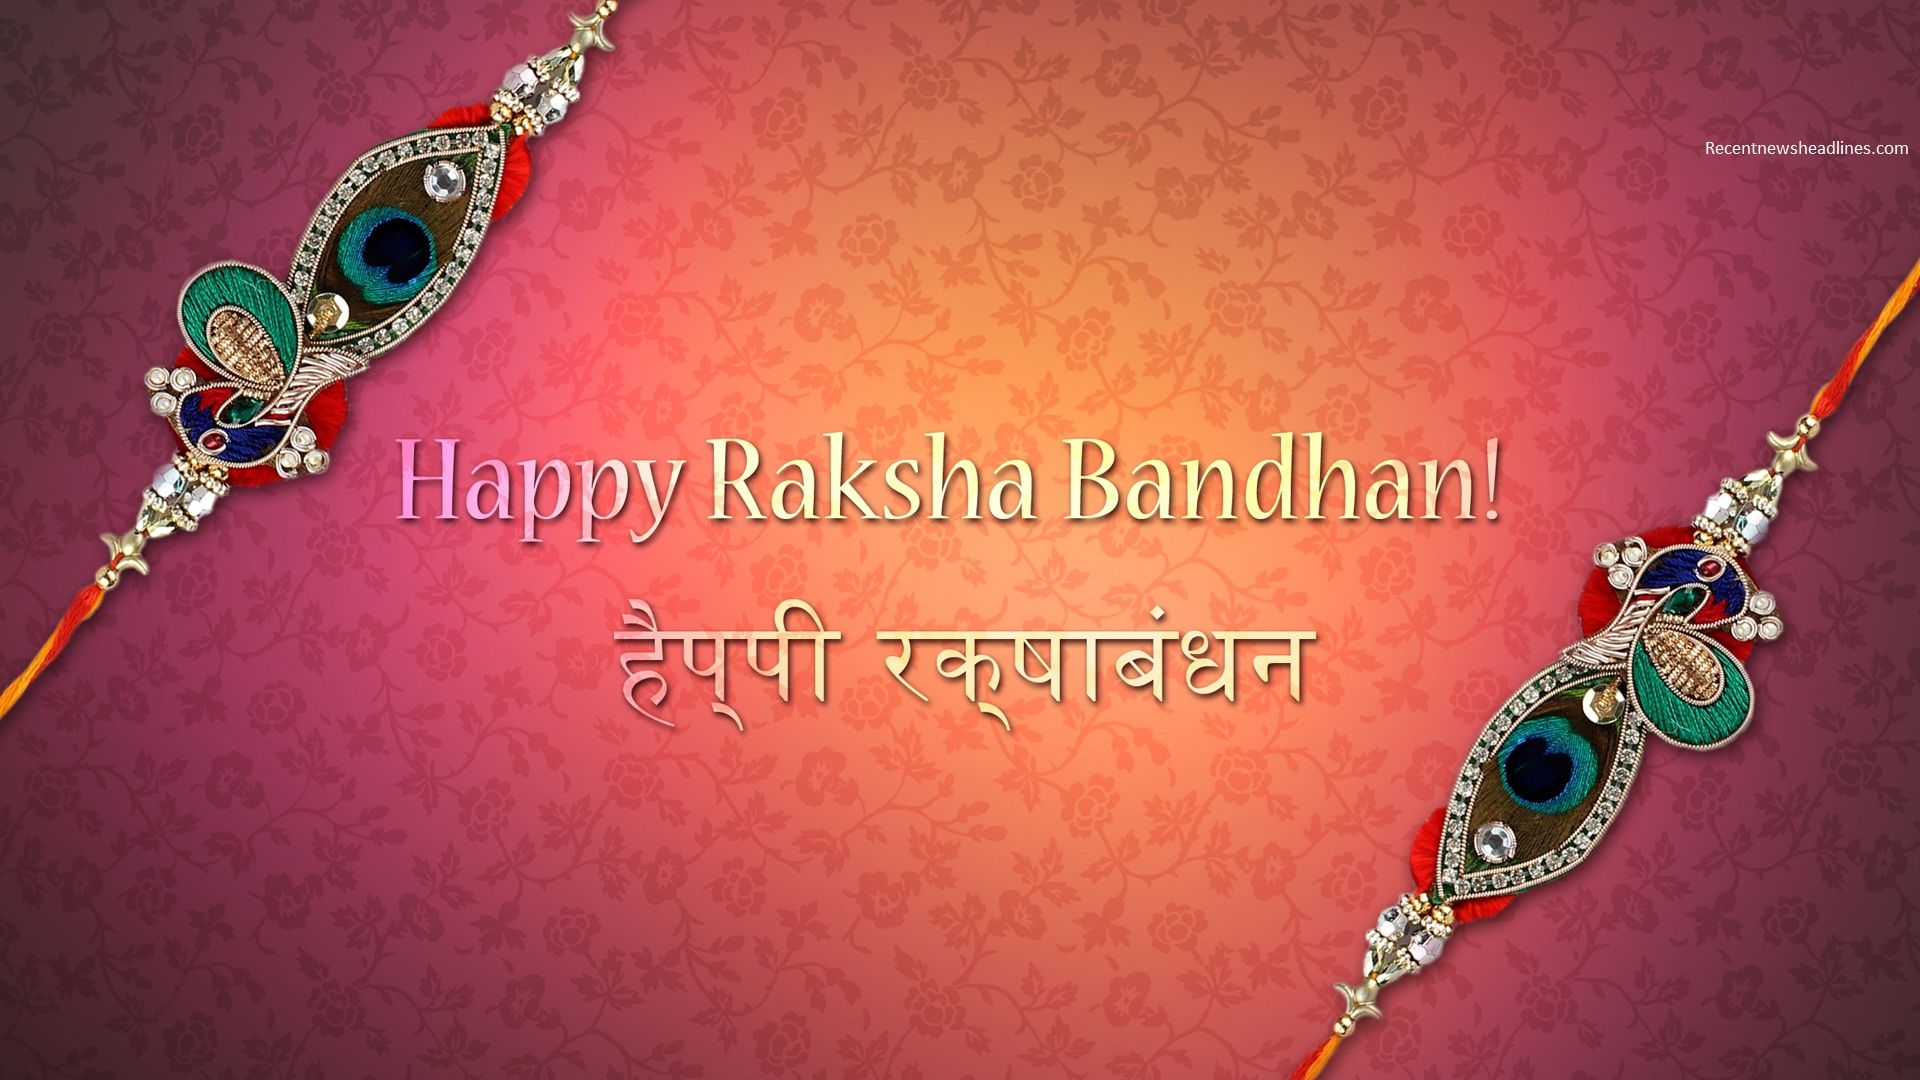 Raksha Bandhan Greeting Cards Recent News Headlines Hindu God